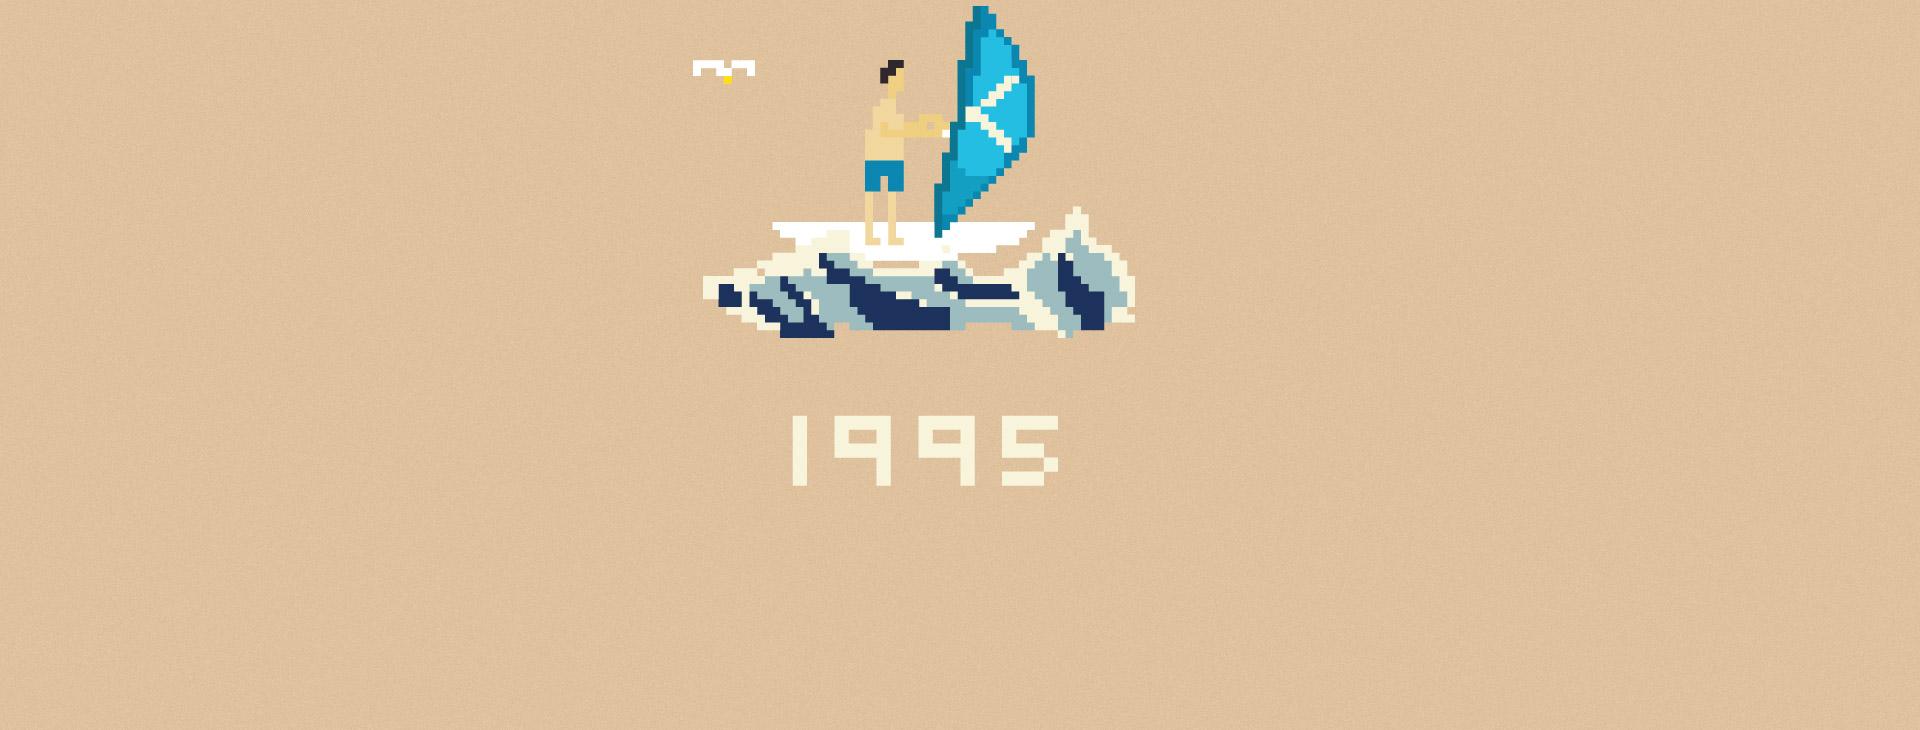 Pixel_1995_Windsurfing_2